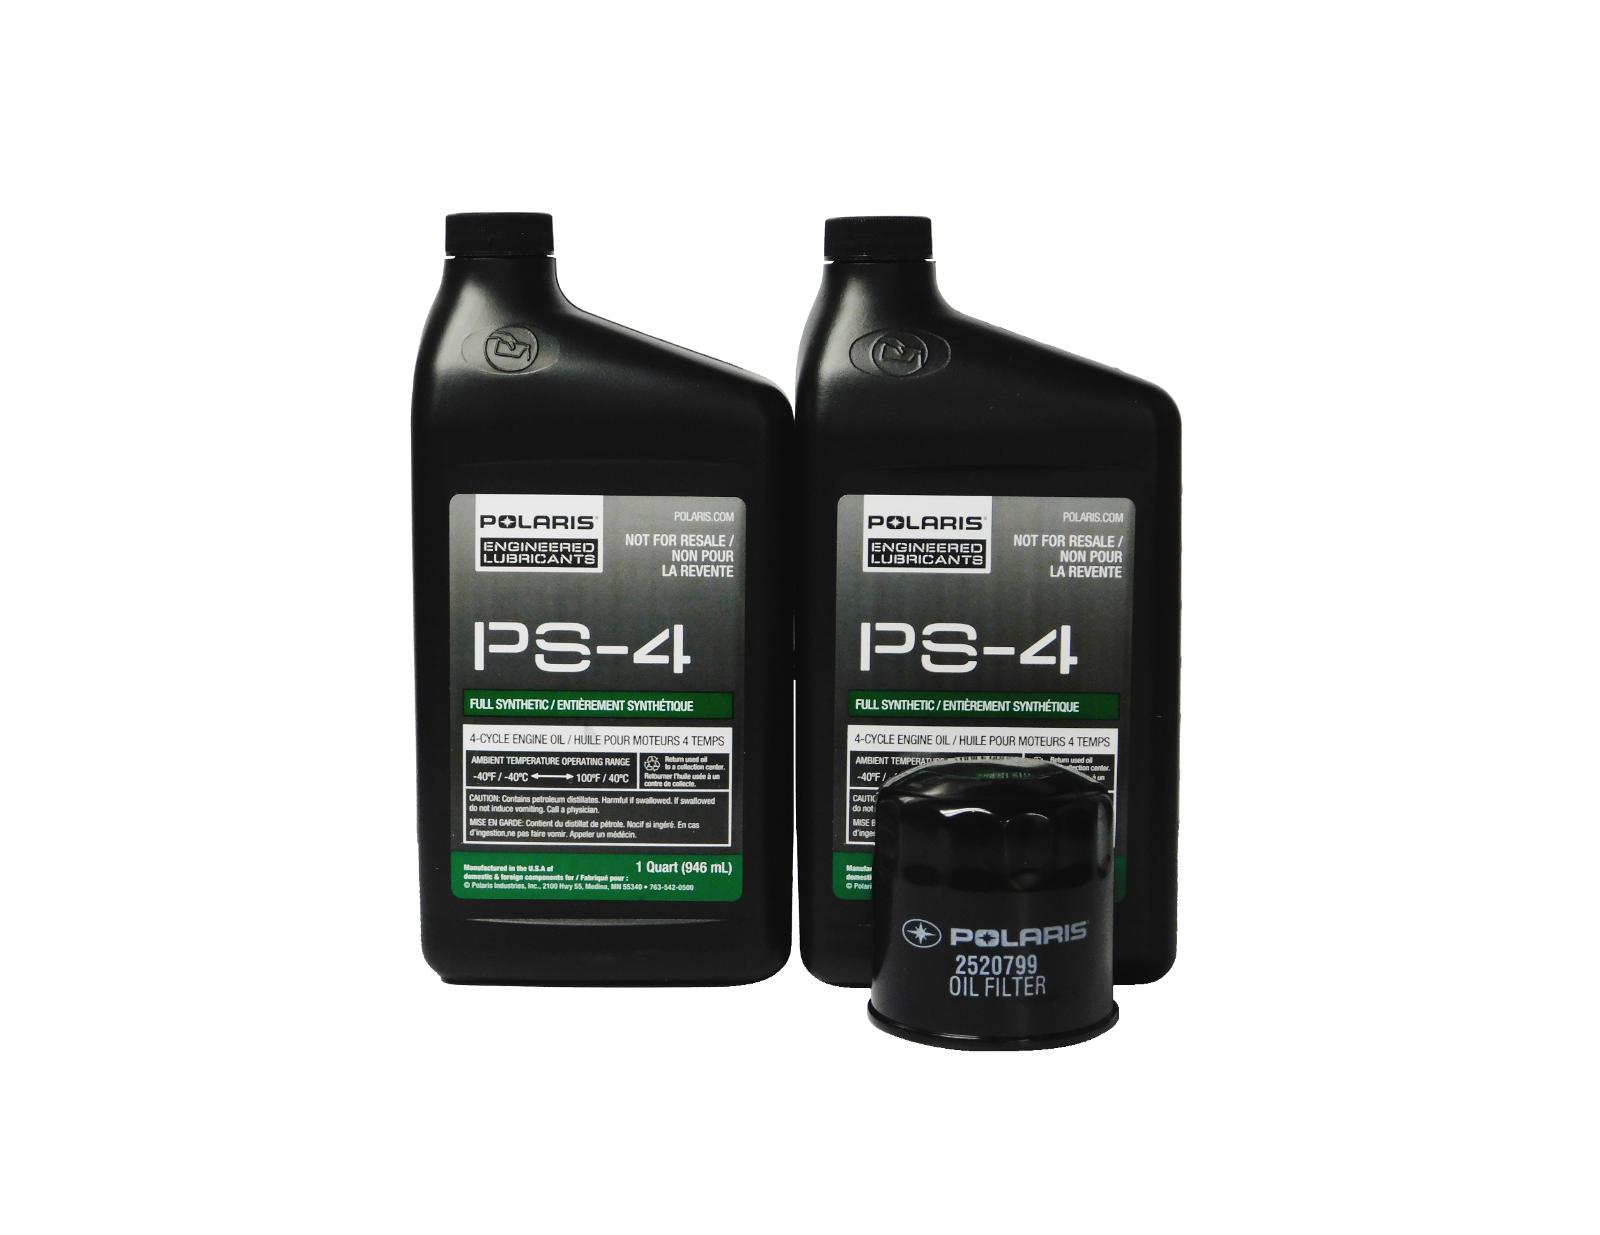 1996-2013 Polaris Sportsman 500 4x4 6x6 EFI HO LE OEM Oil Change Kit 2877473 - $39.99